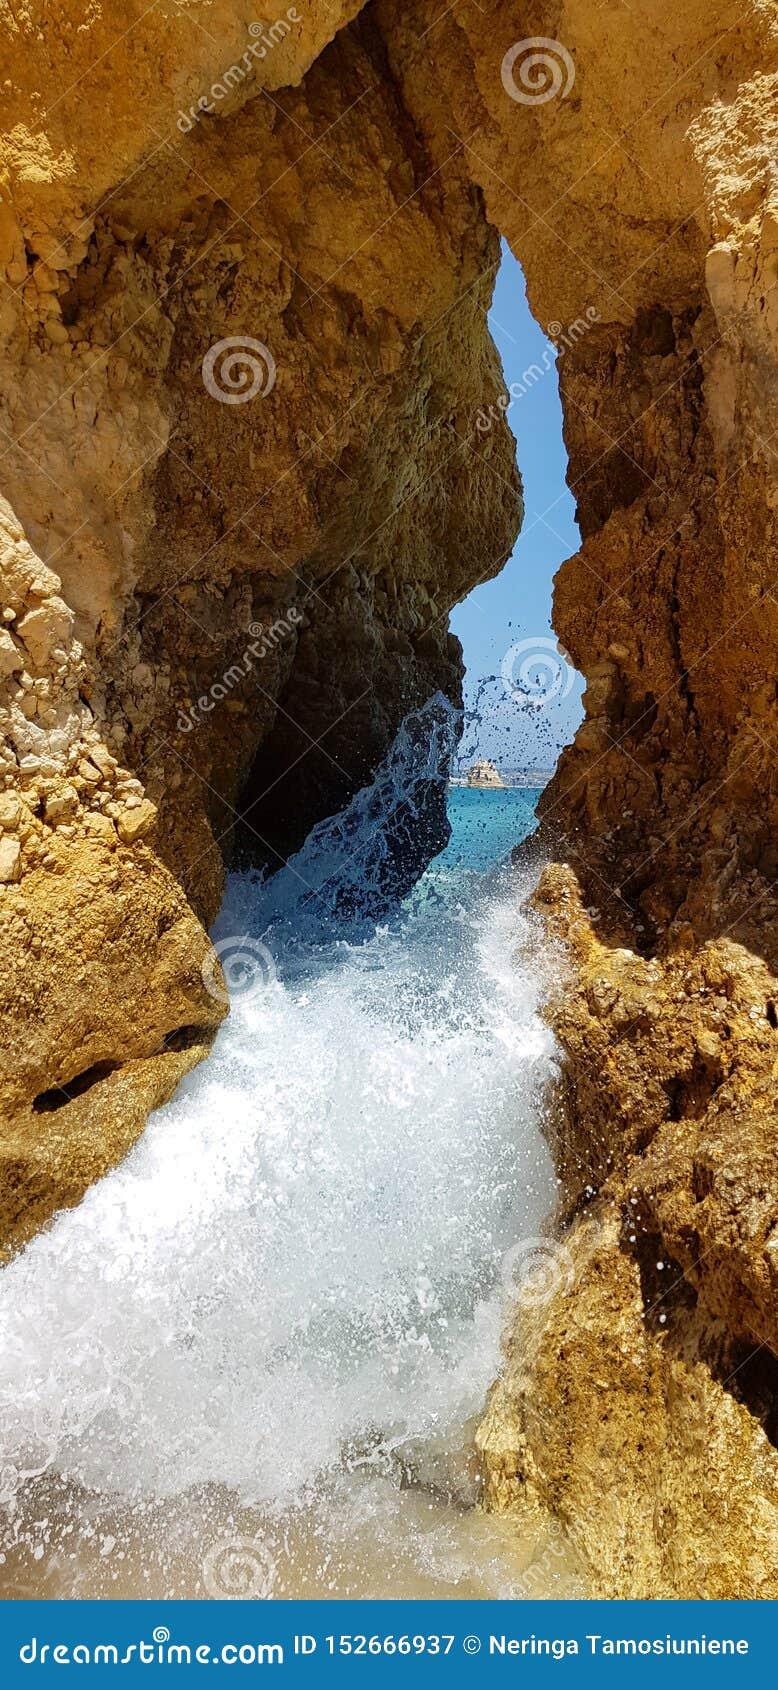 Penhascos bonitos na turquesa Oceano Atlântico perto do Praia Dona Ana da praia, Lagos, Portugal